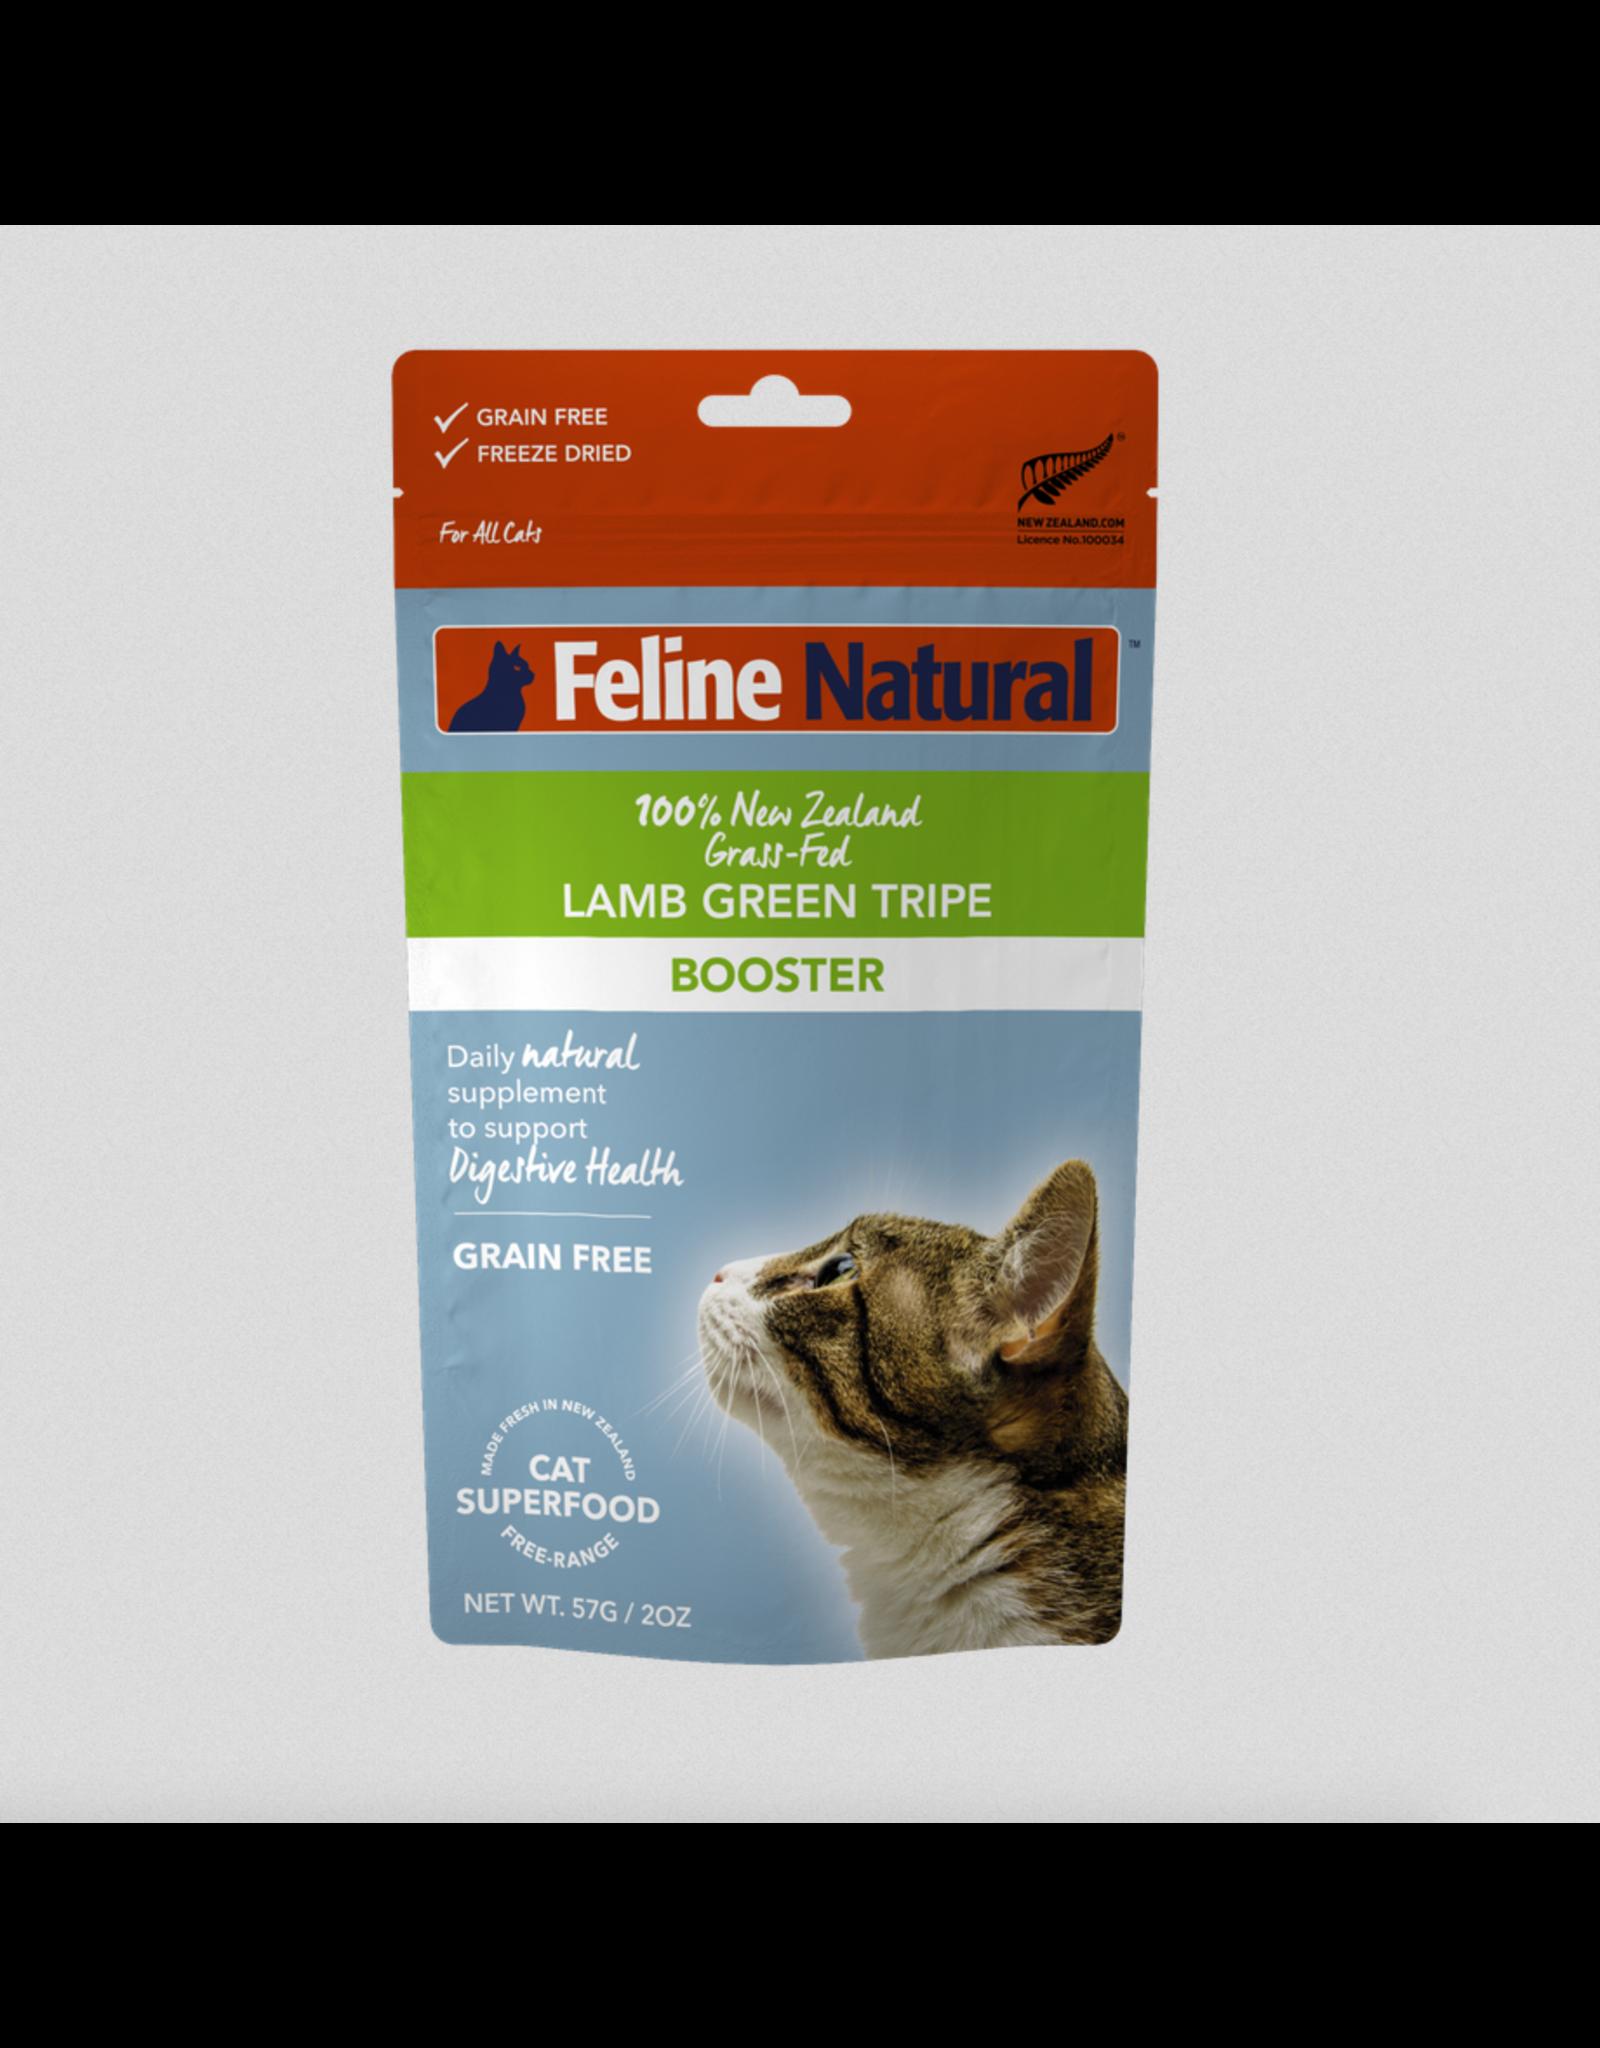 Feline Natural Feline Natural Freeze Dried Lamb Green Tripe 2oz